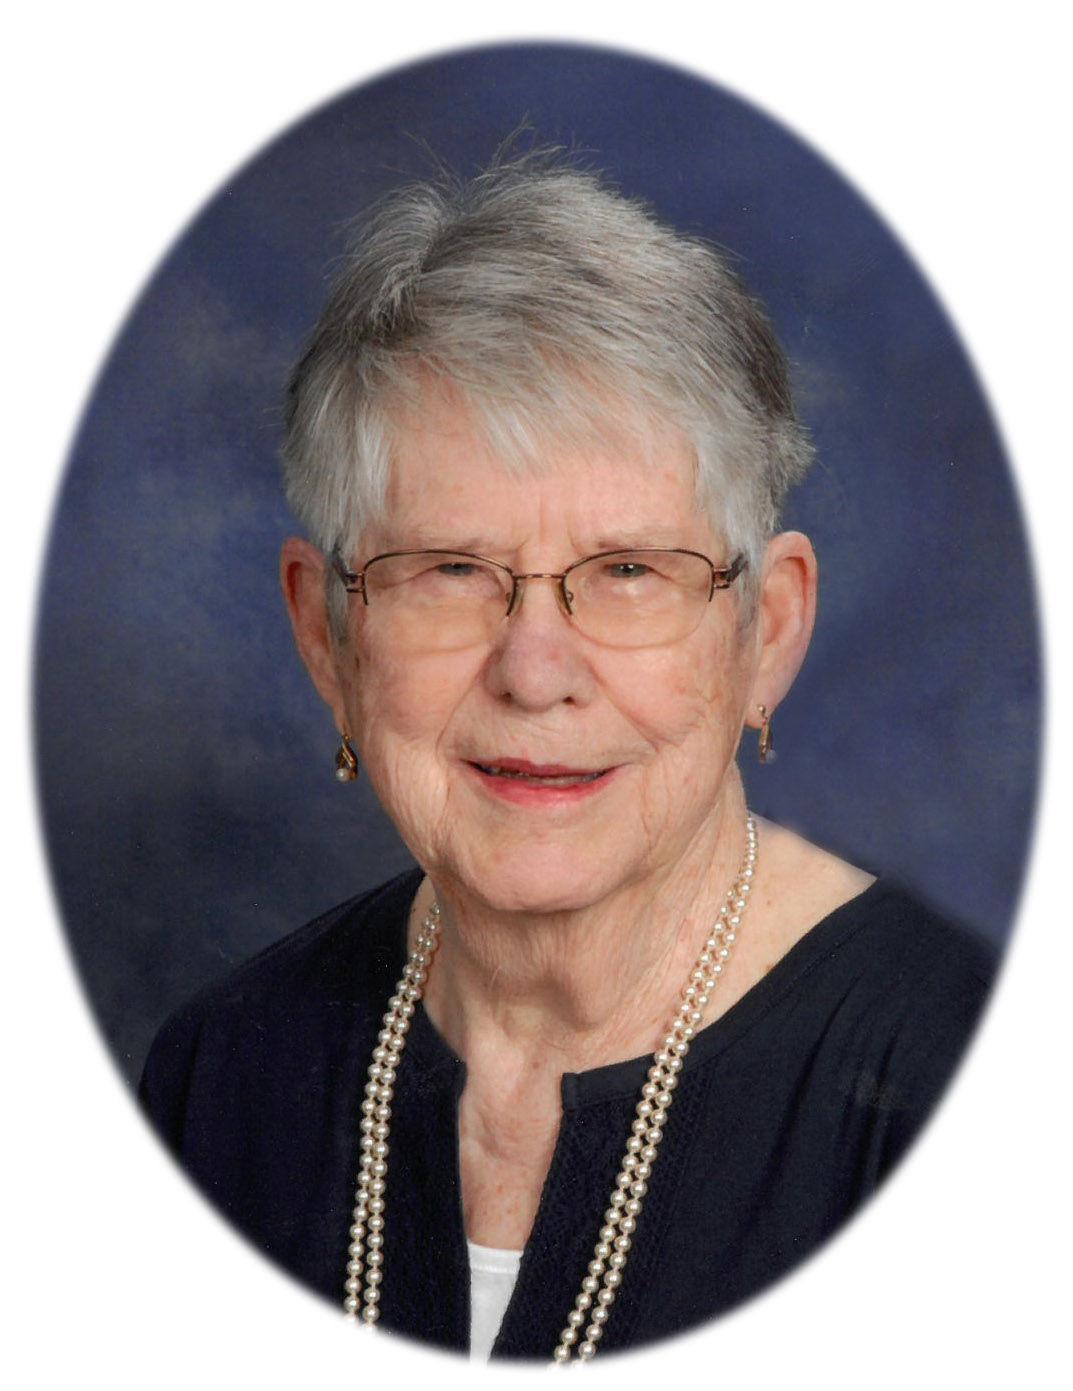 Betty Irene Smith